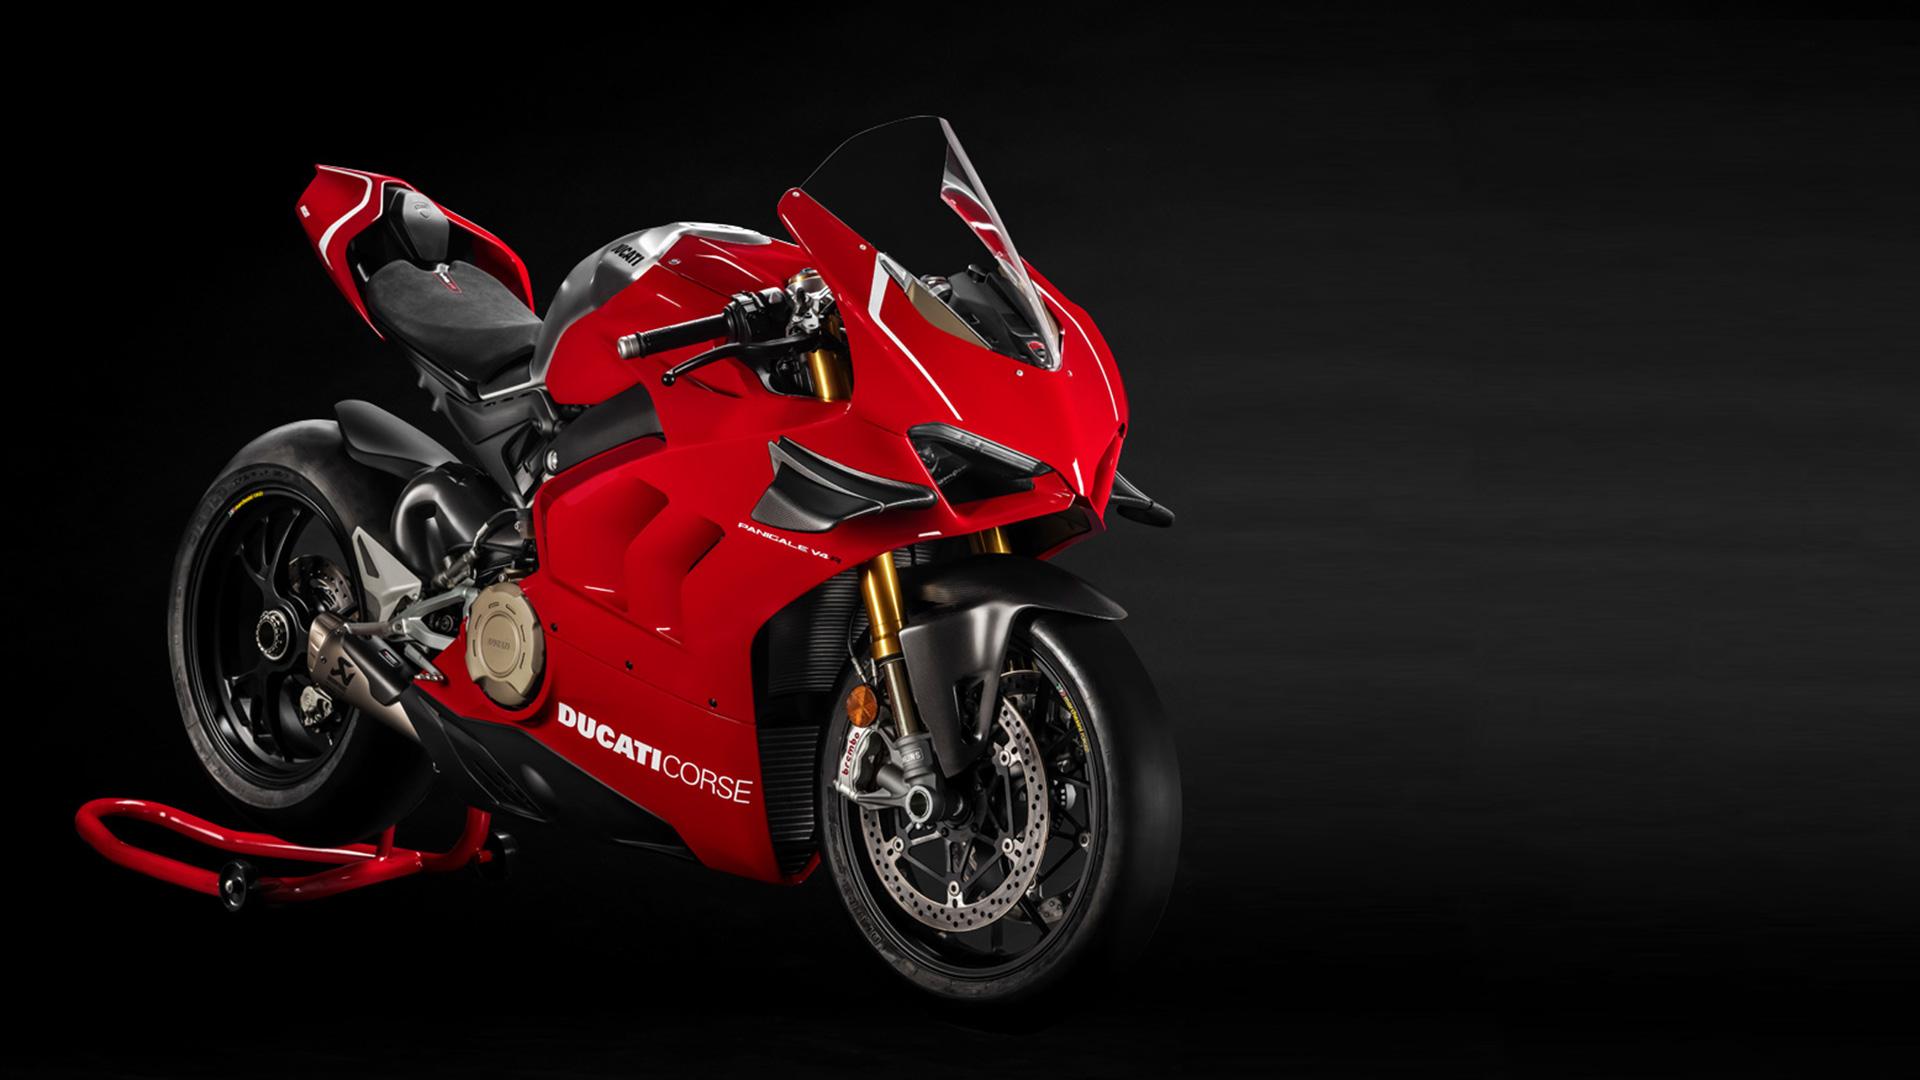 Ducati Panigale V4 2019 R